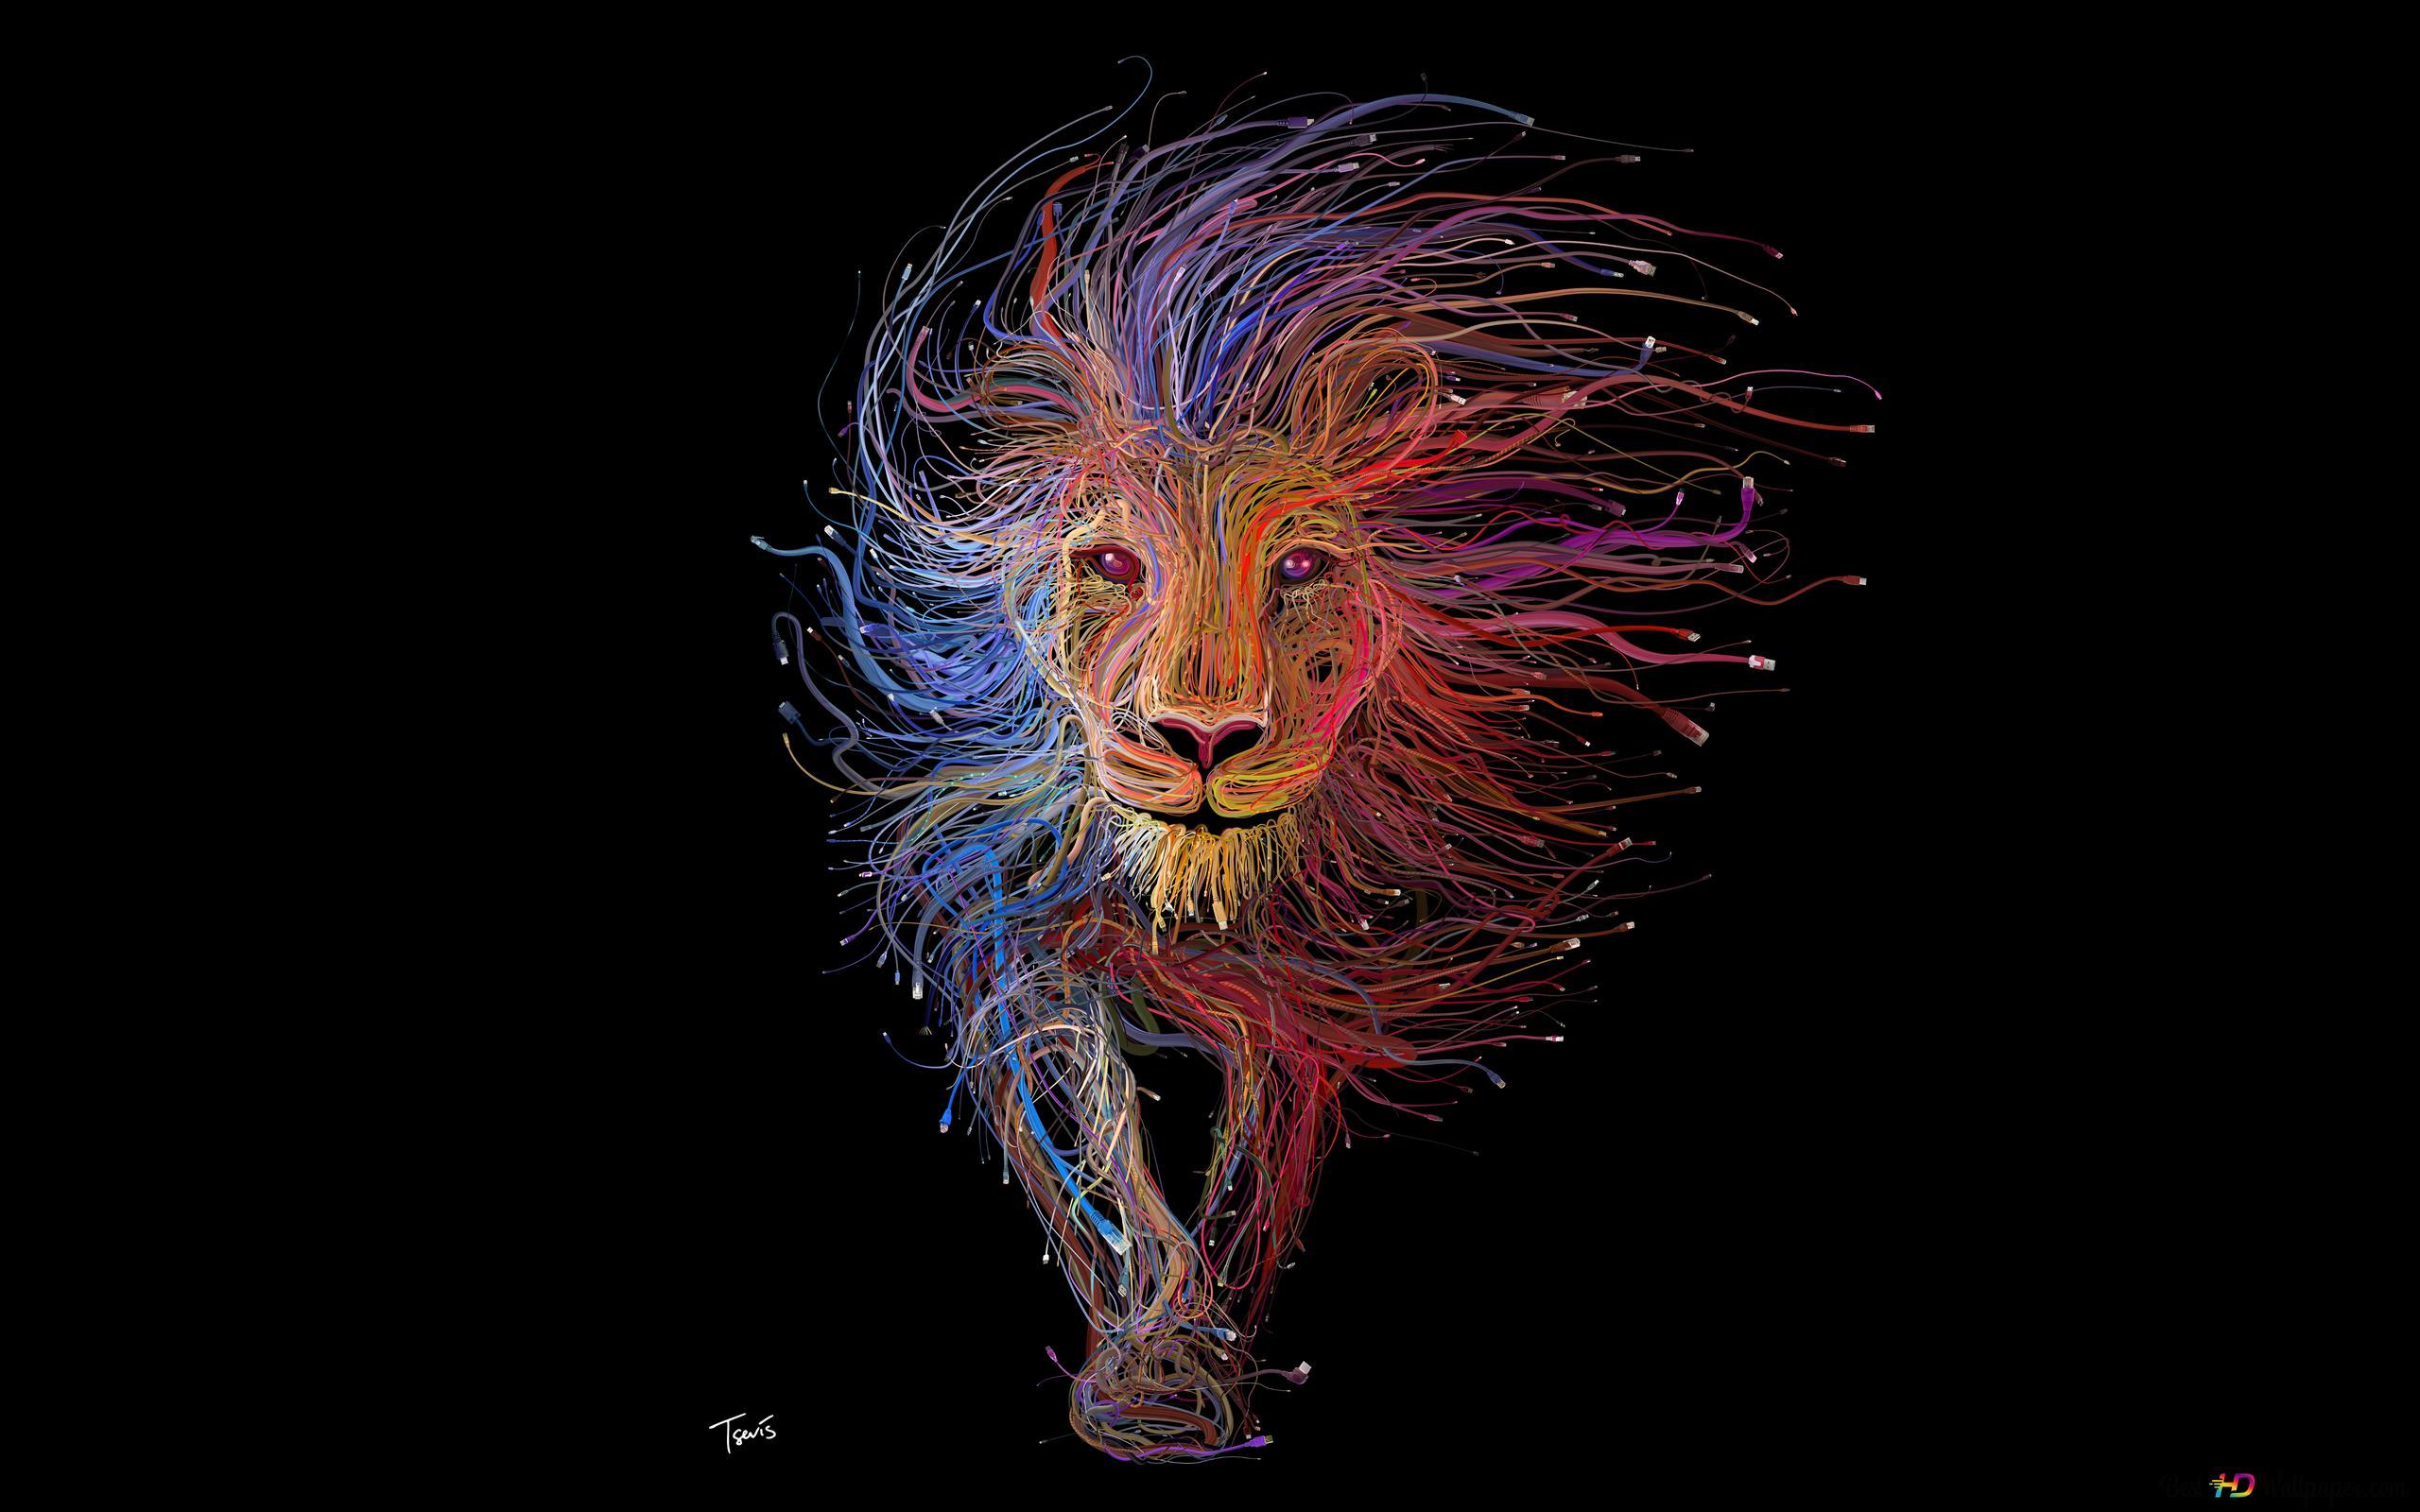 colorful lion wallpaper 2560x1600 26758 7